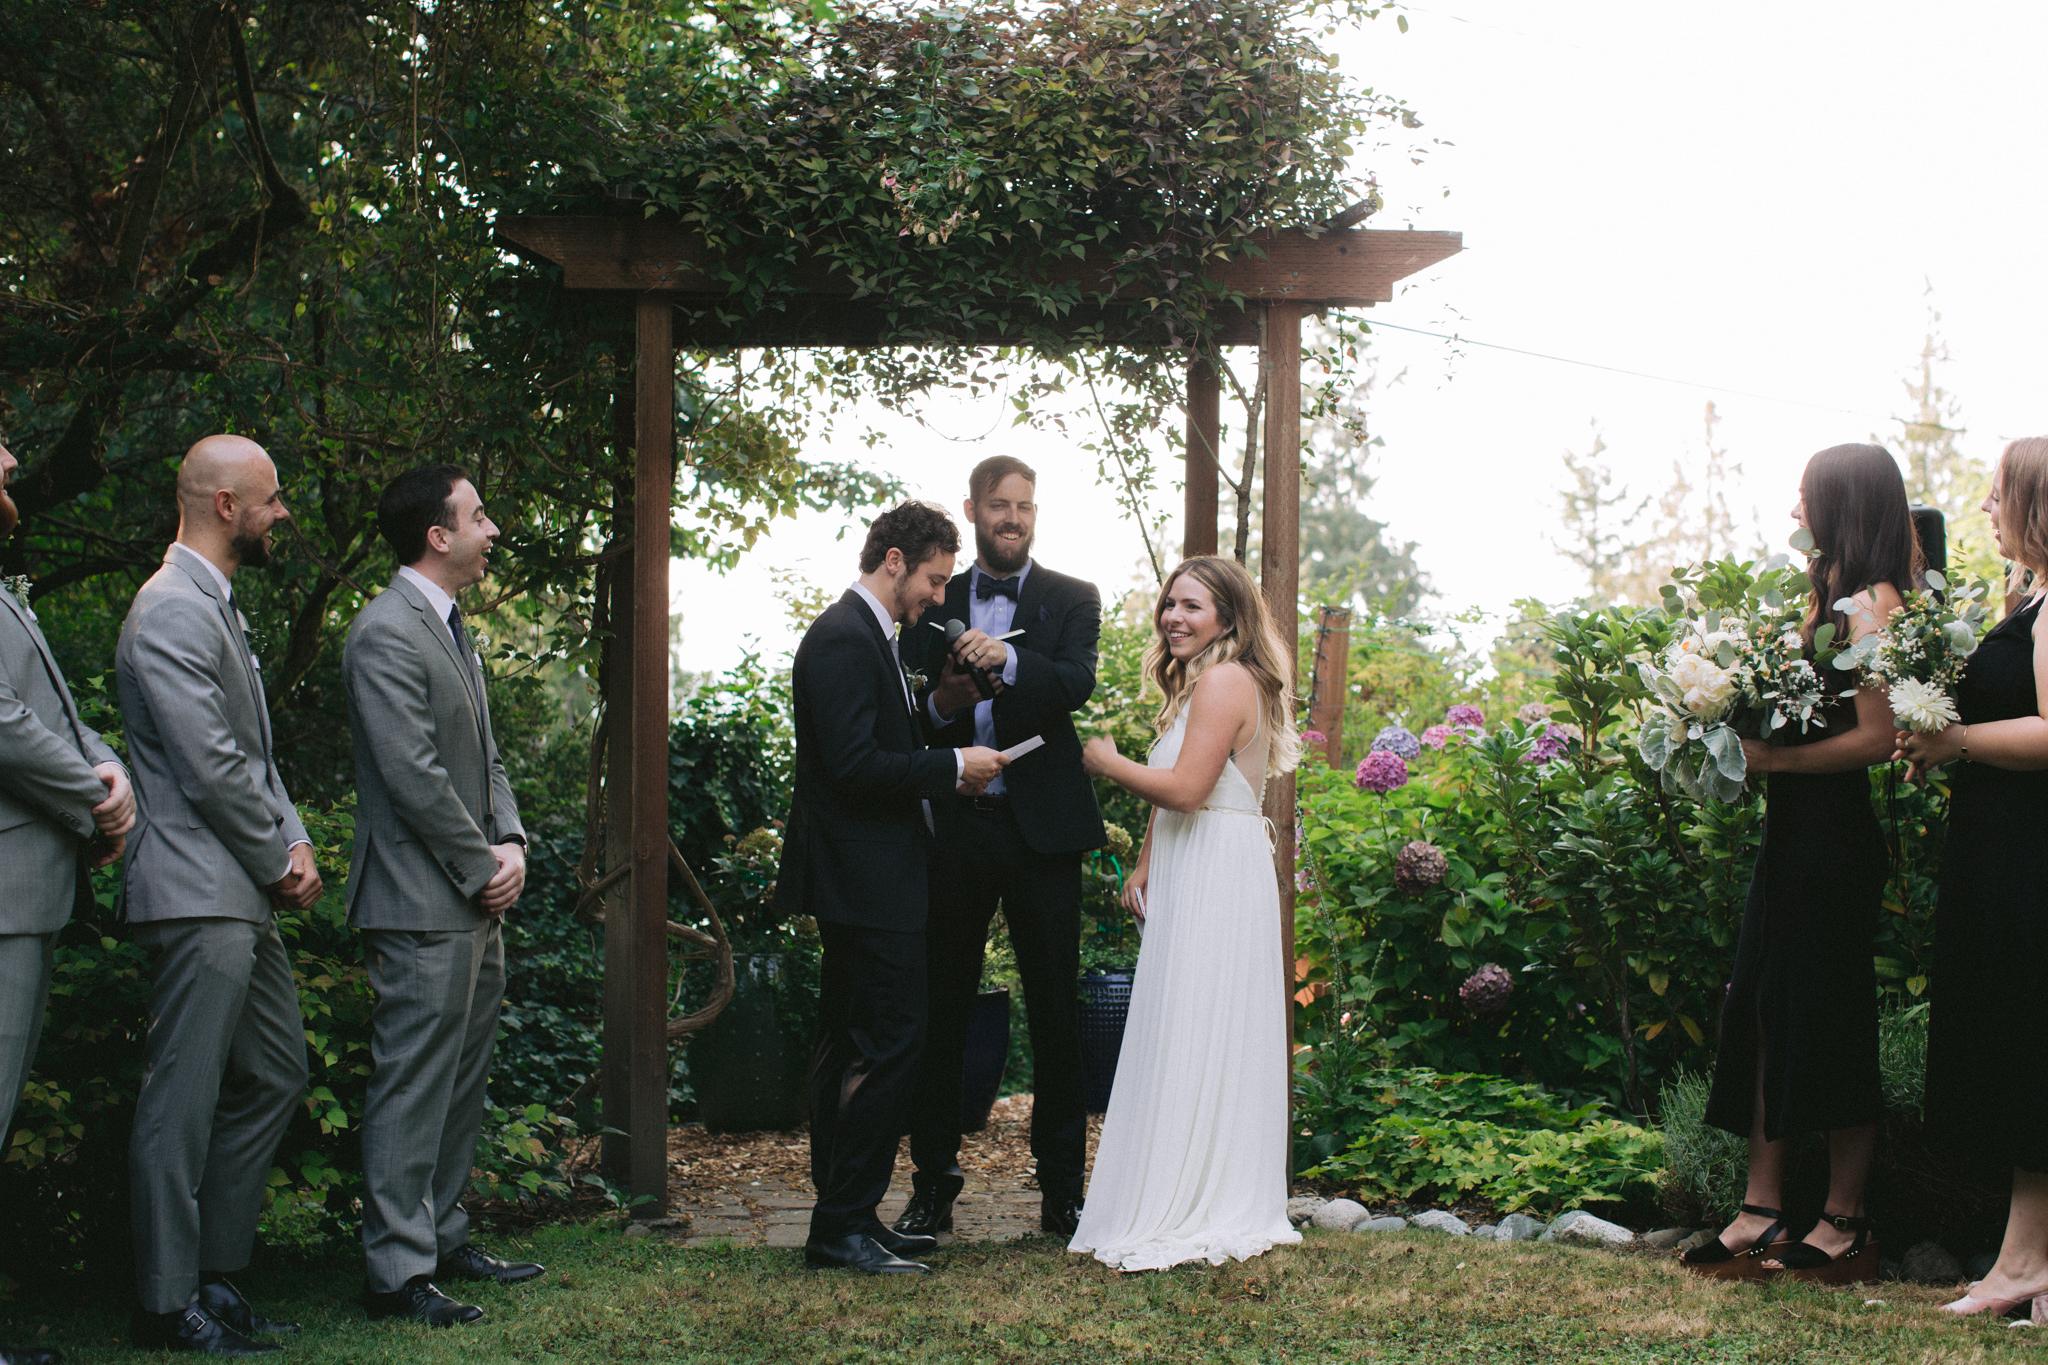 Backyard-Bainbridge-Island-Wedding-Alycia-Lovell-Photography-106.JPG